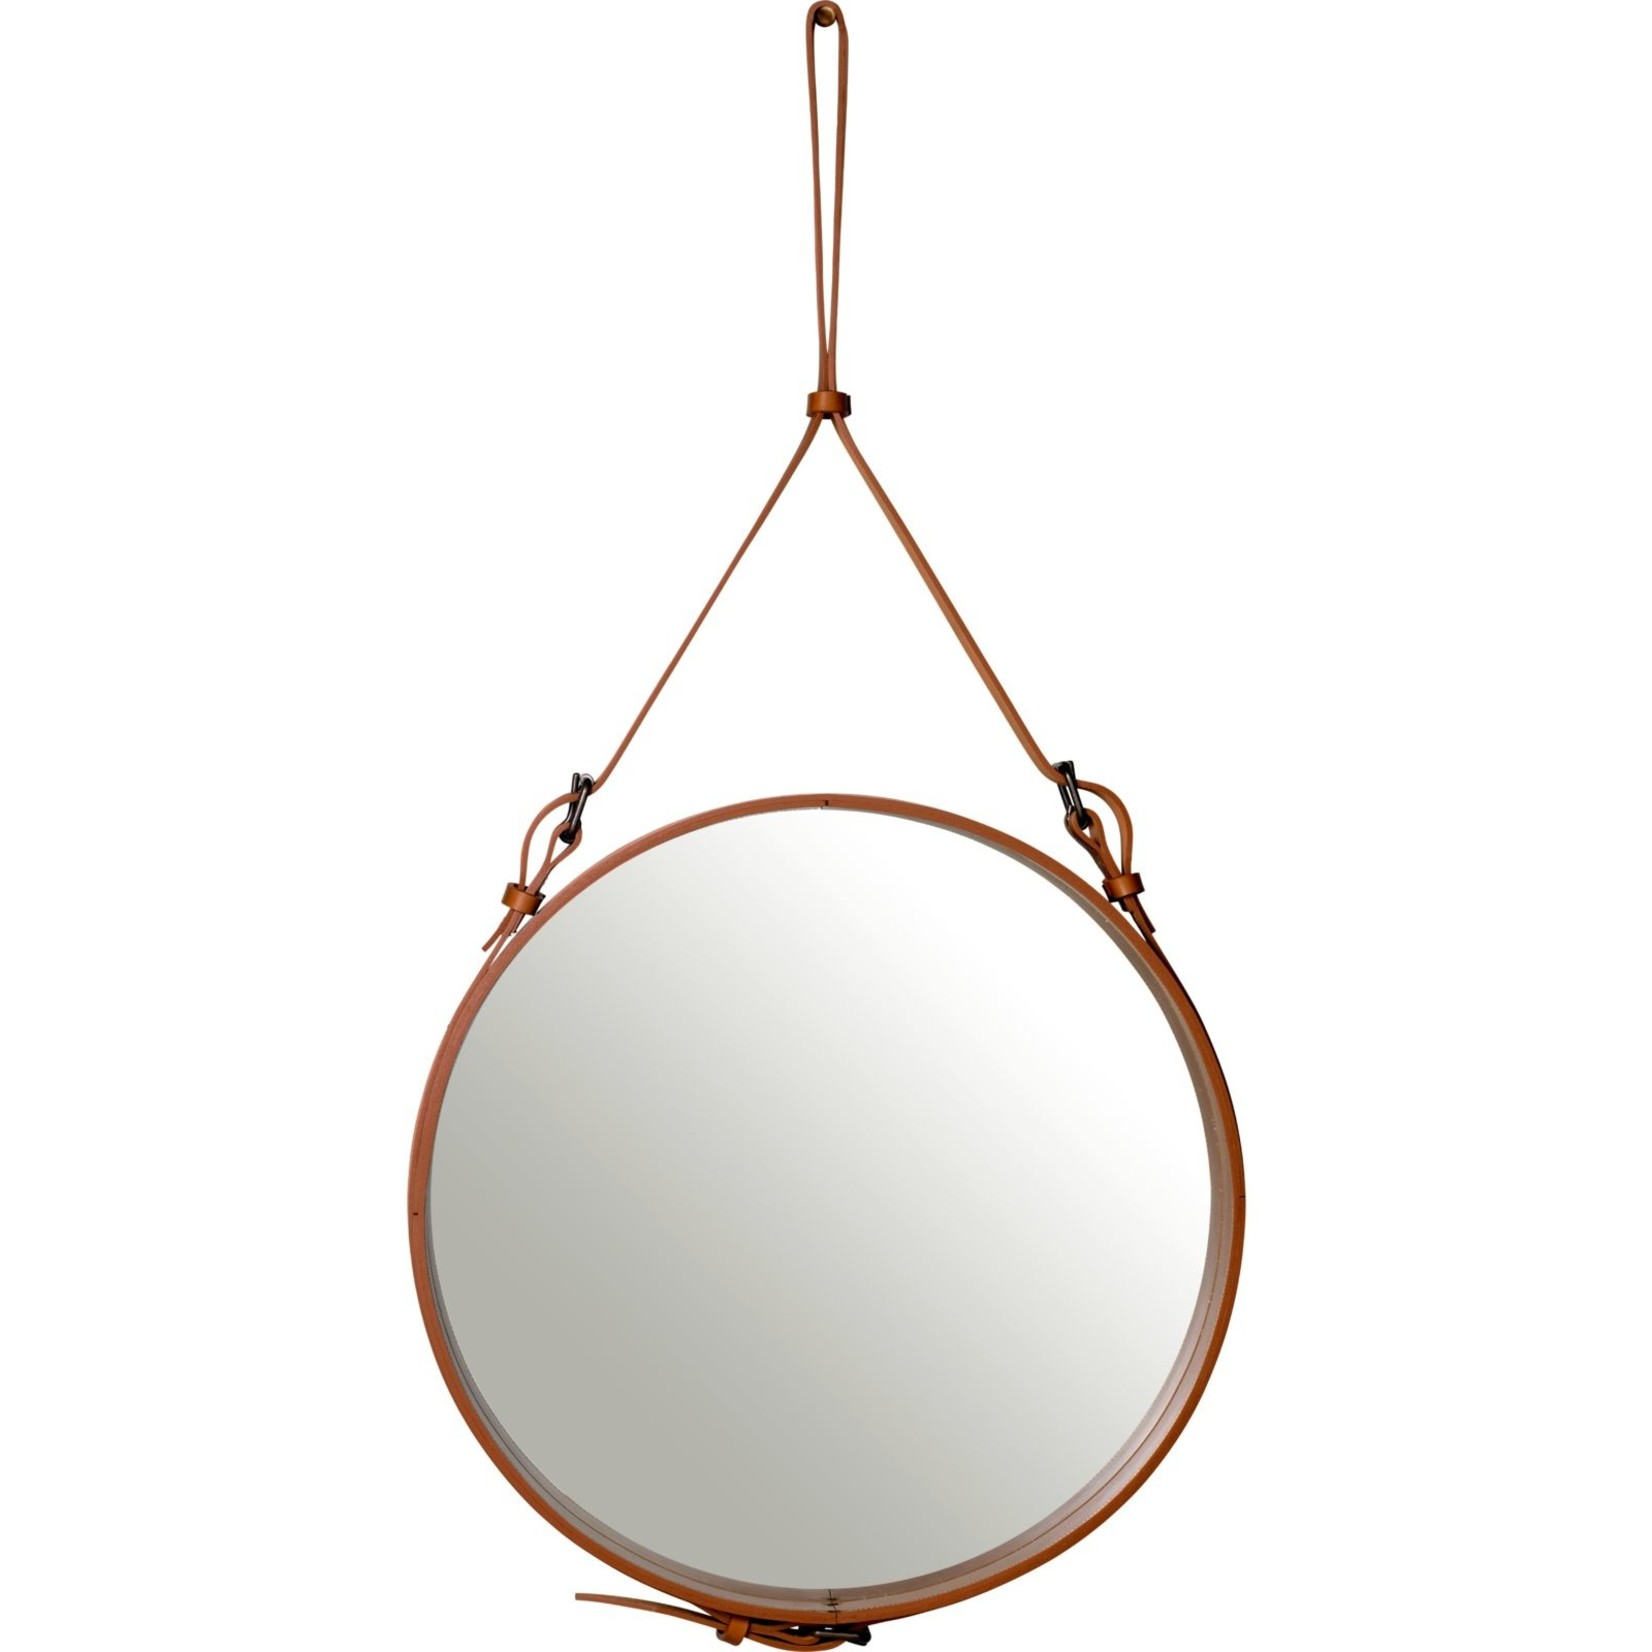 Gubi Wall mirror Adnet - Round - Ø58 - Tan Leather